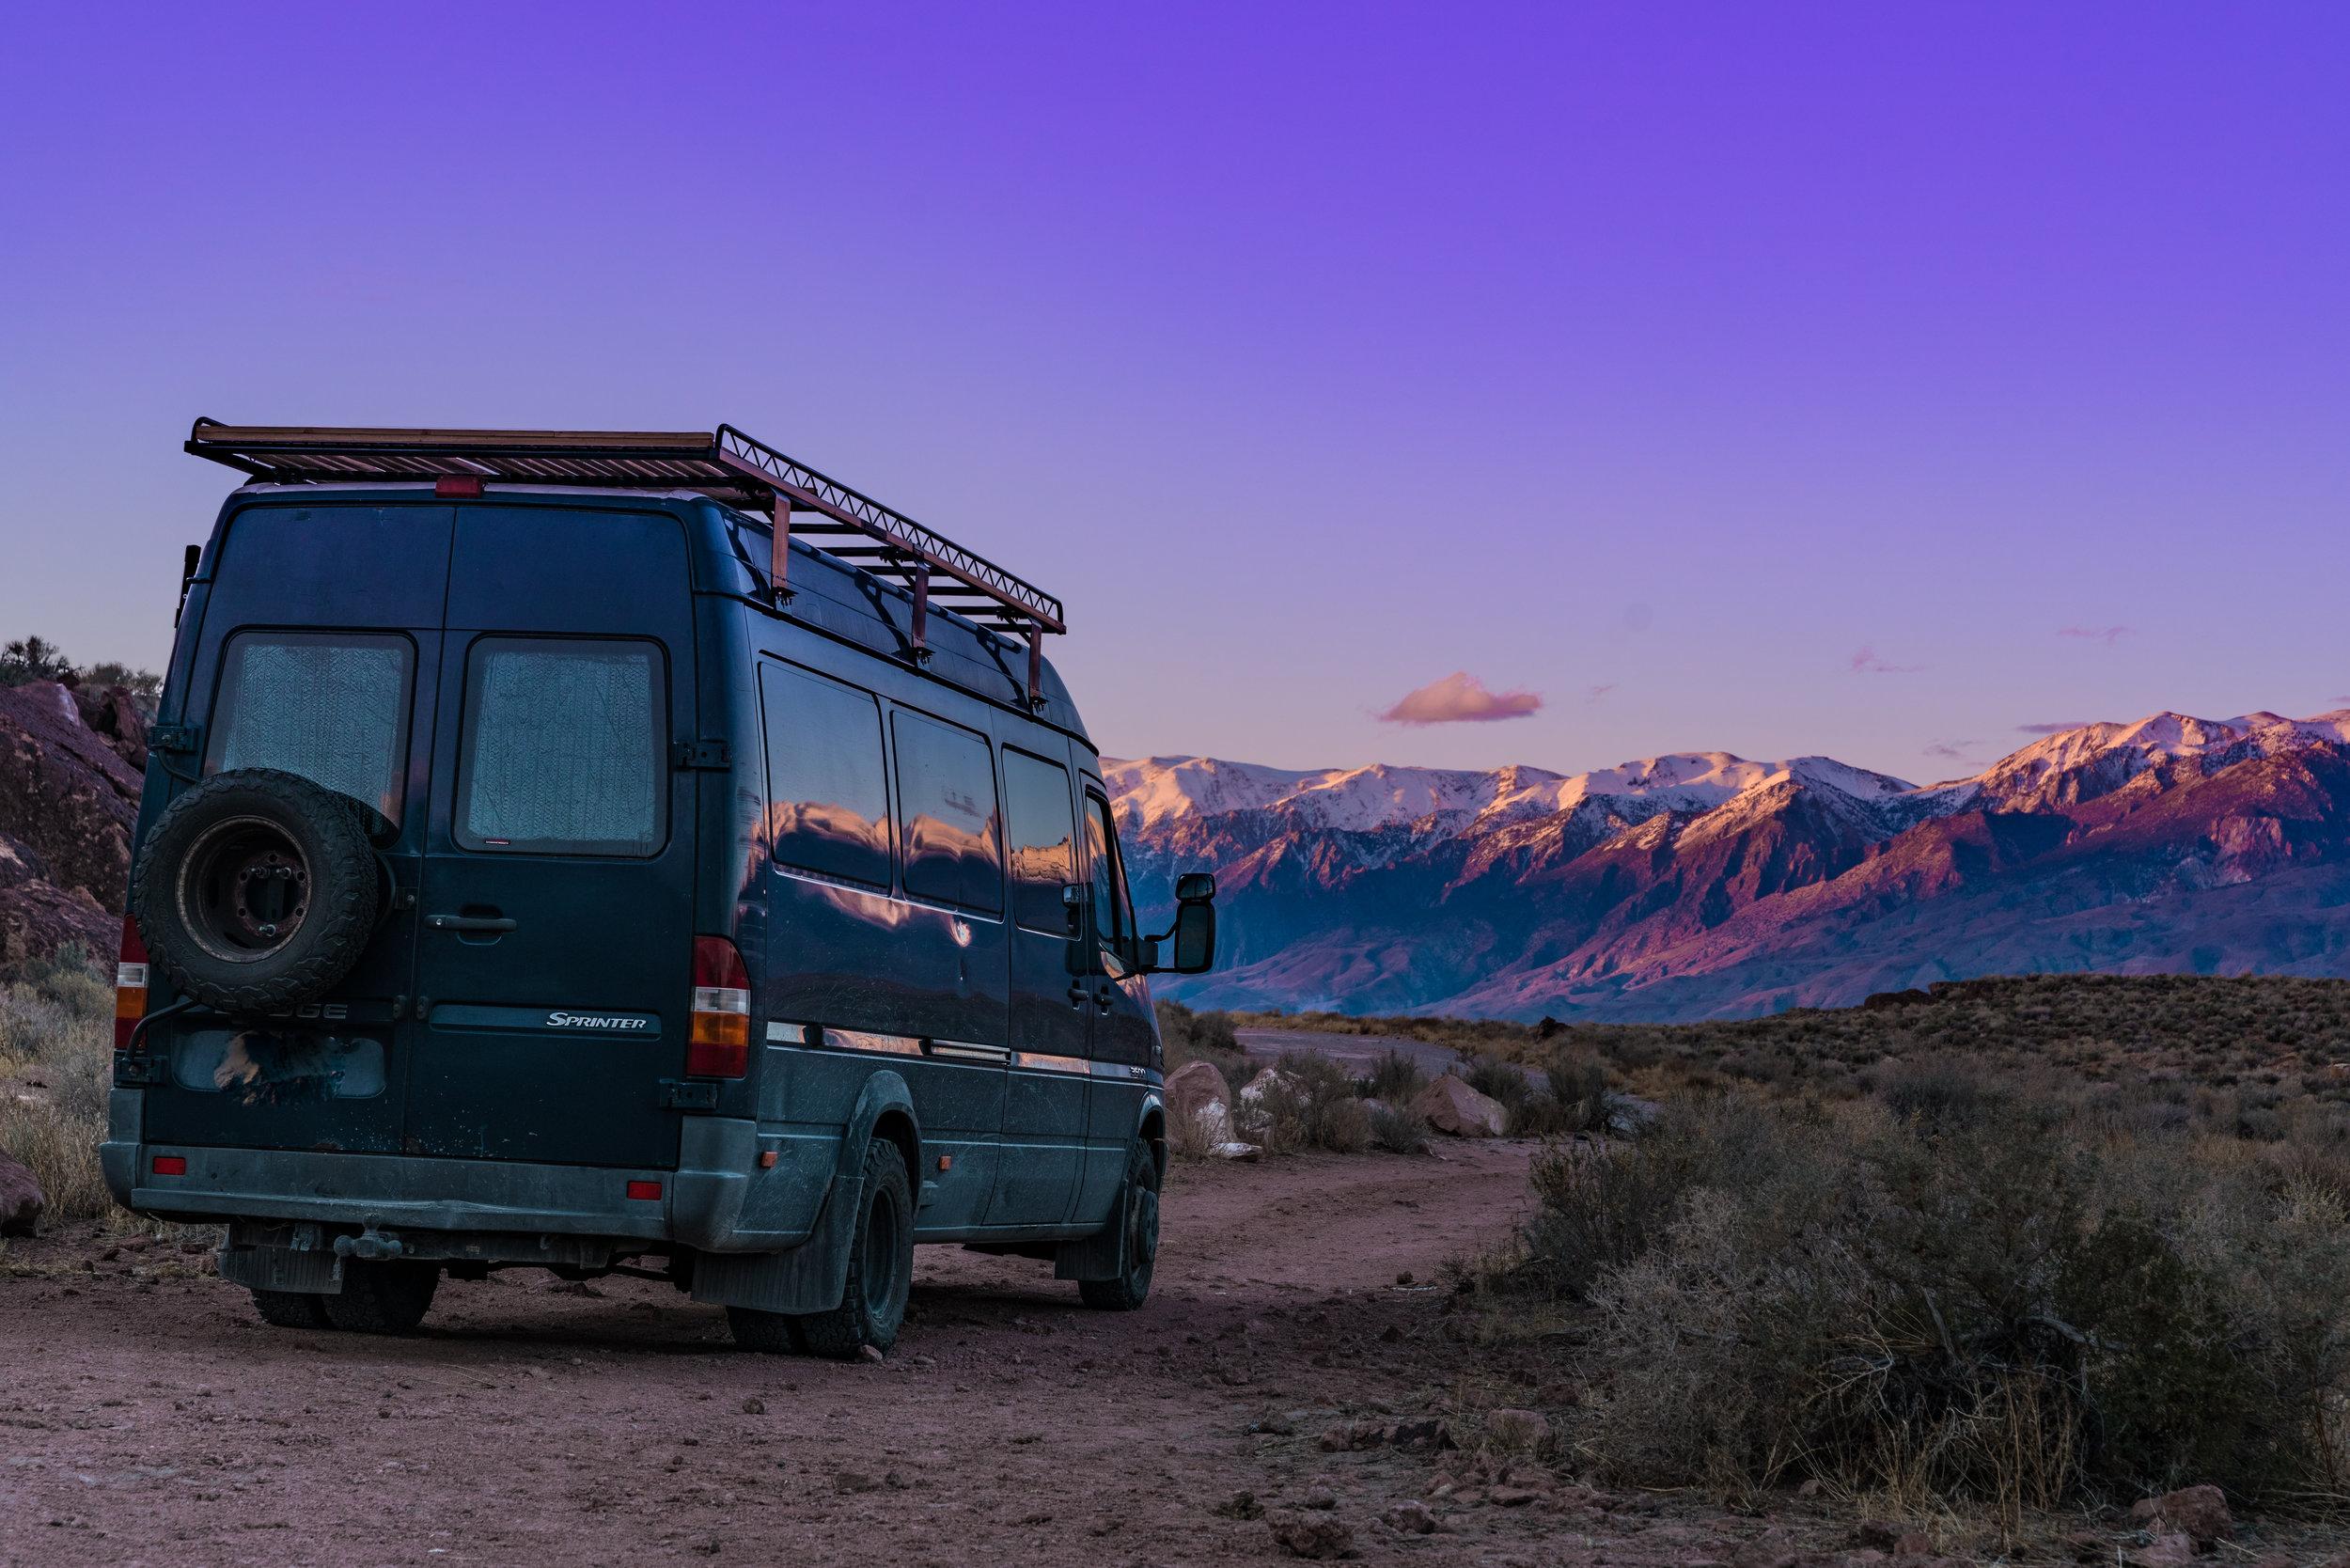 Desert Van (2 of 2).jpg